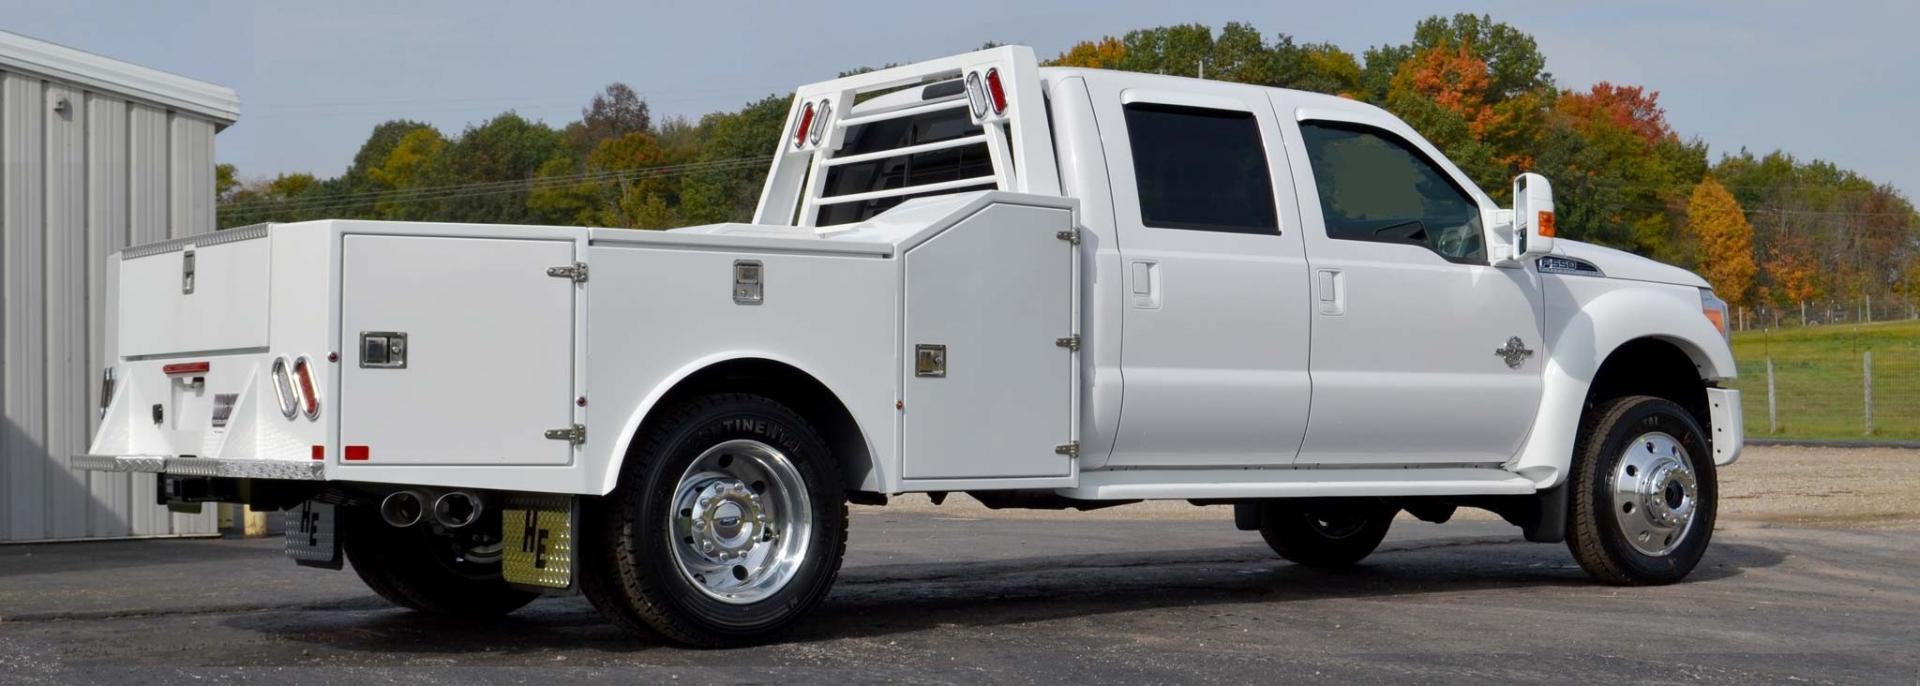 Home - Hughes Equipment | 740-398-8649 Mount Vernon, Ohio